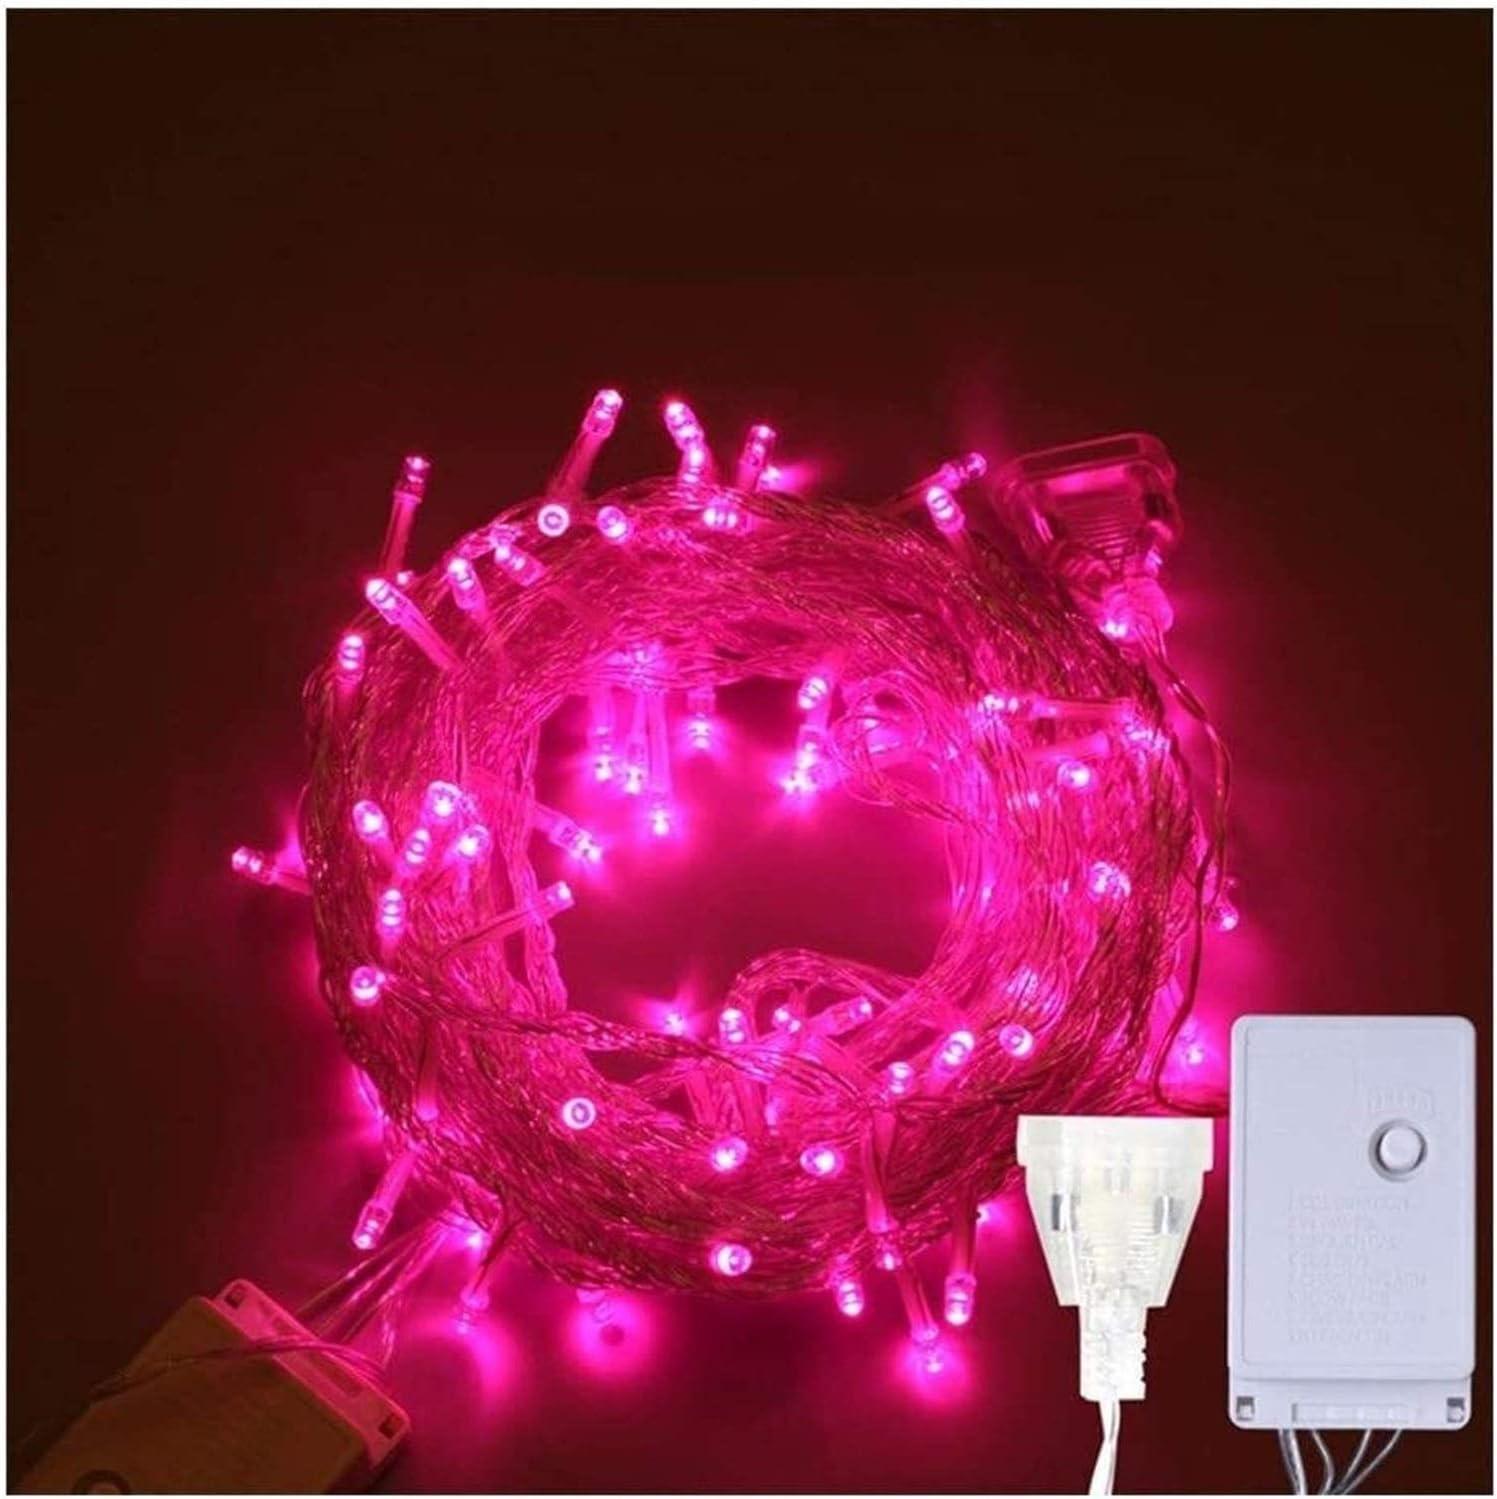 WANGJUNXIU Halloween String Limited price Lights 67% OFF of fixed price ,100-6000 Fairy LED